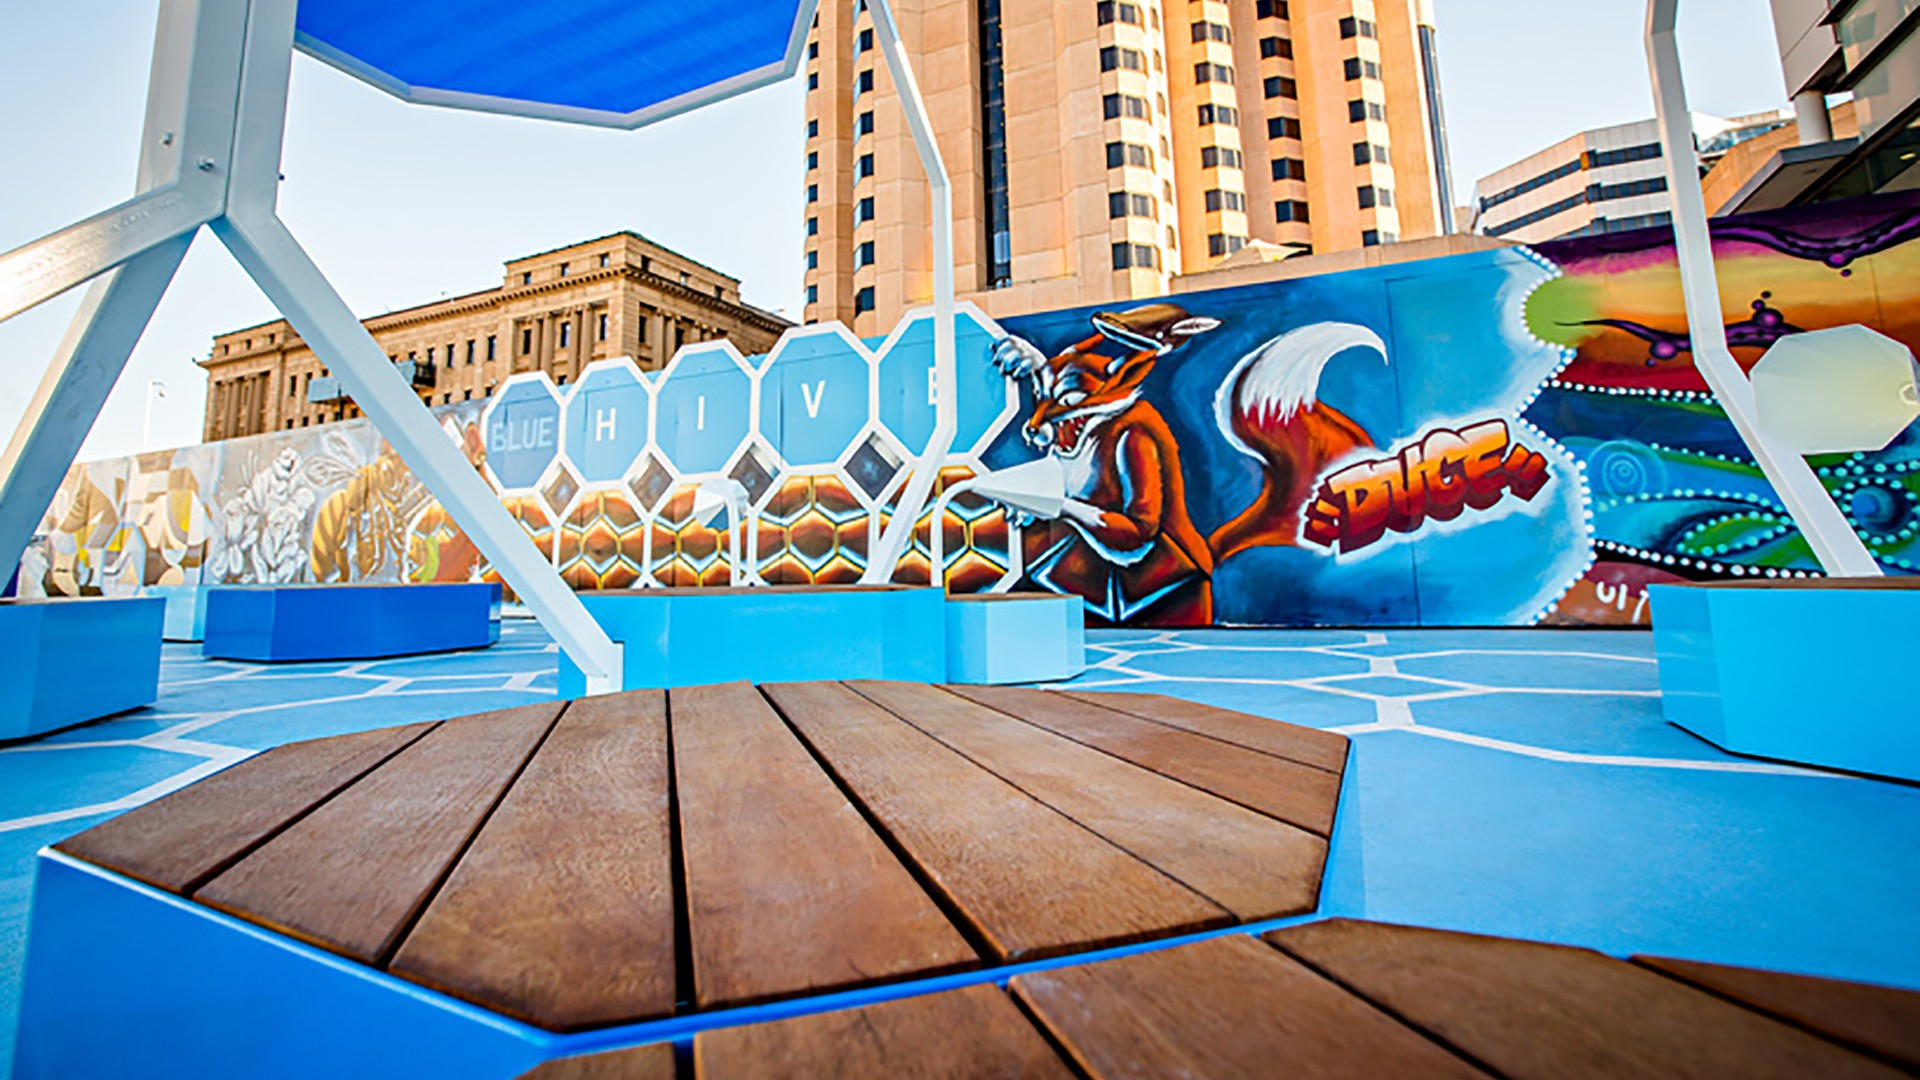 The-Blue-Hive-River-Bank-Promenade-Adelaide-20-2